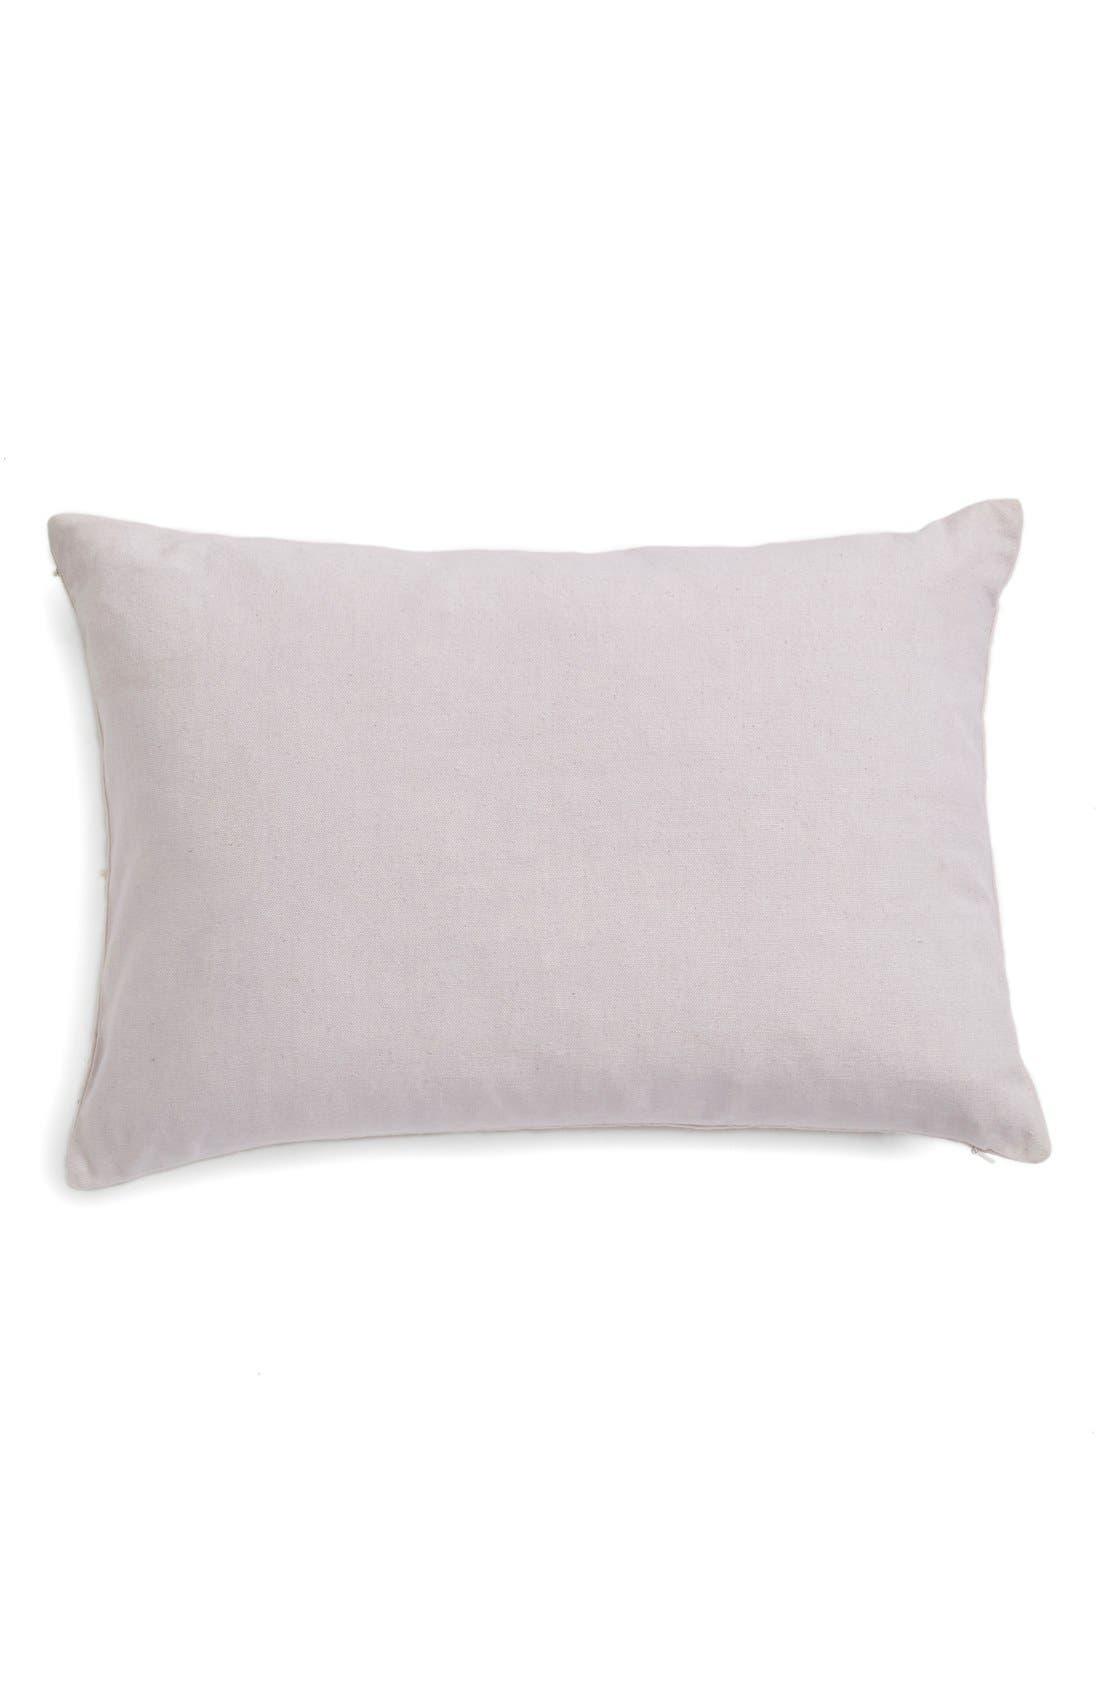 Alternate Image 3  - Nordstrom at Home 'Gem Stripes' Accent Pillow